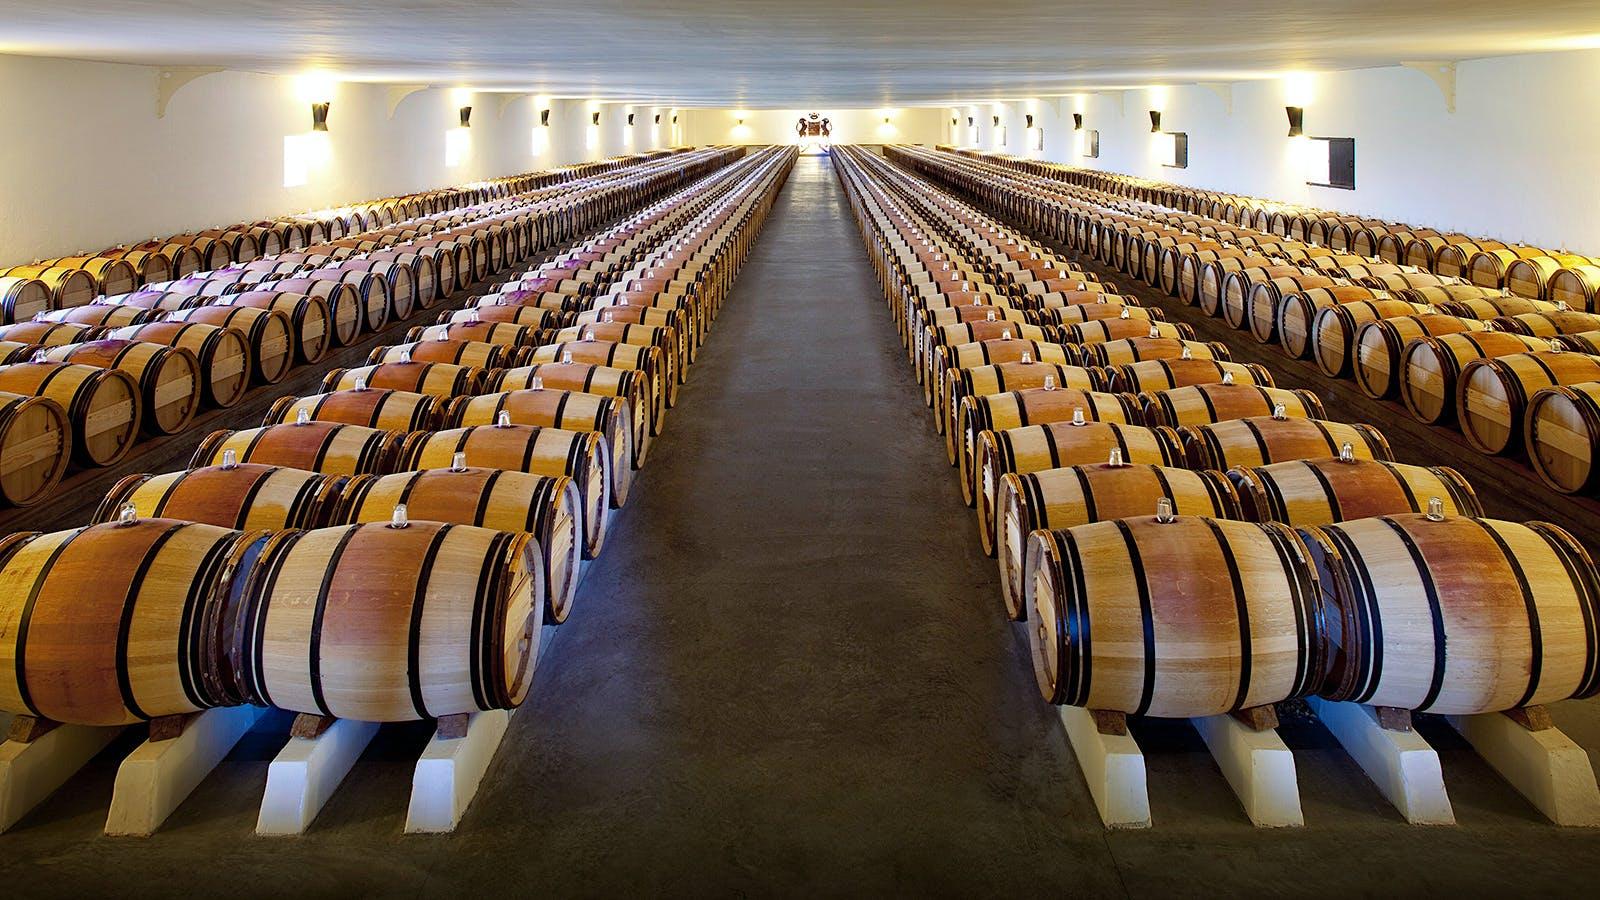 2017 Bordeaux Barrel Tastings: Top Dry Whites